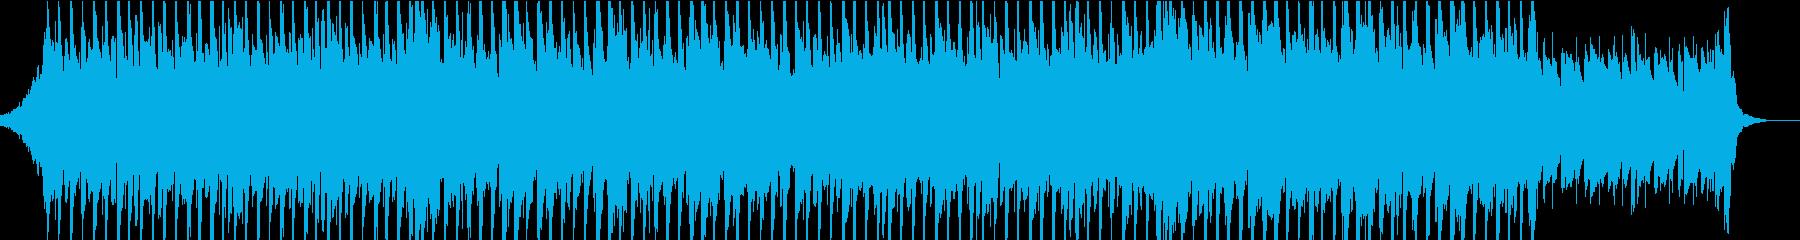 Folk Acoustic's reproduced waveform